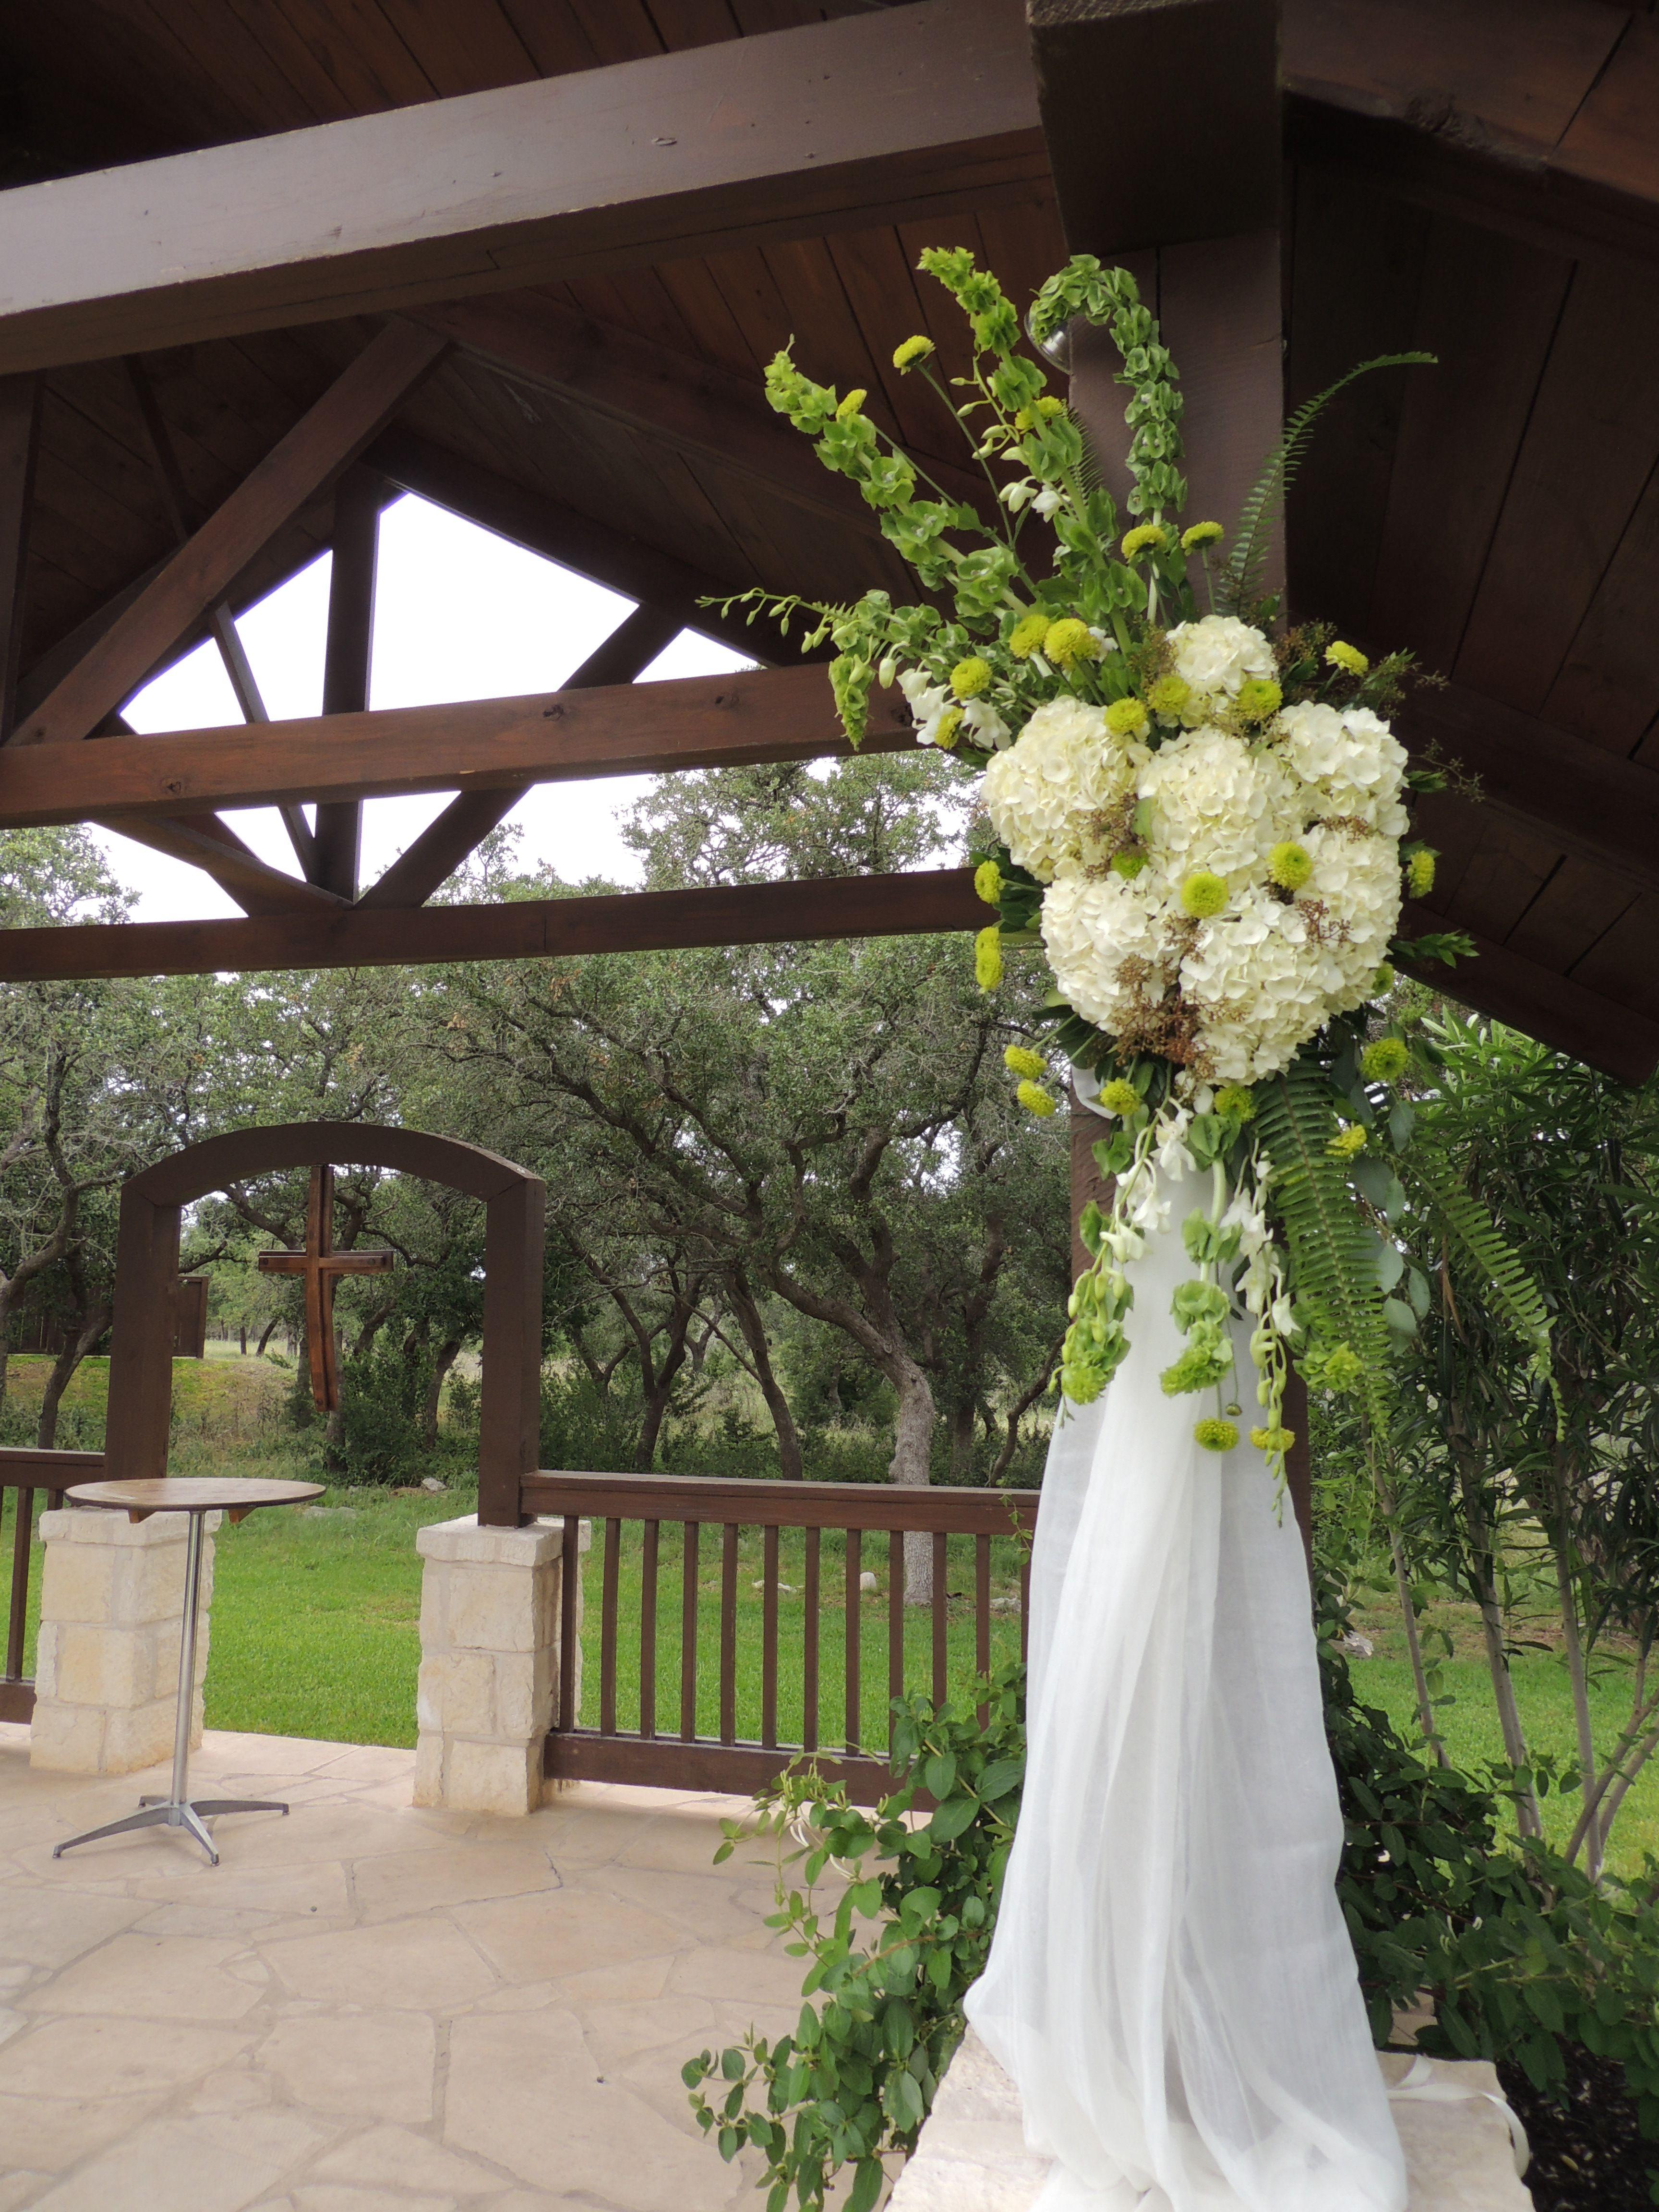 interesting wedding venues ireland%0A Outdoor wedding  Ceremony decor  Gazebo decor  Lime green  Mum